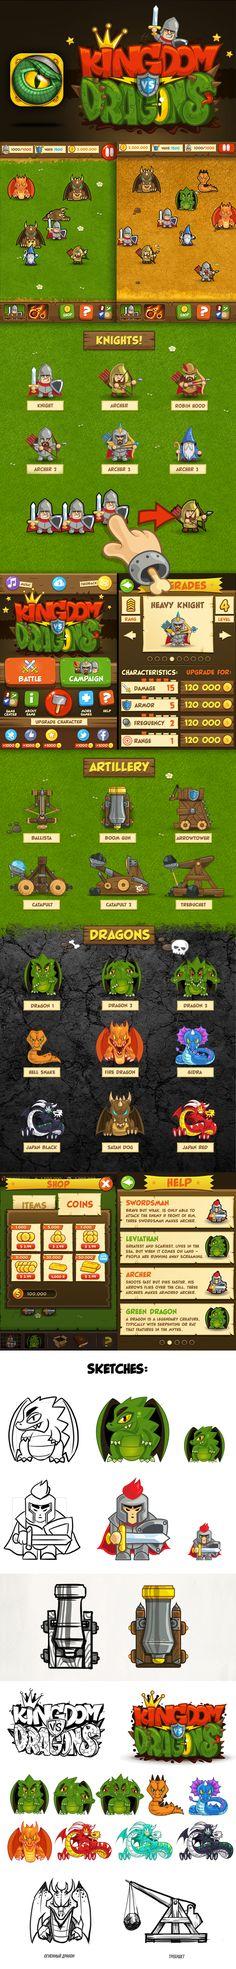 Kingdom Dragons on Behance